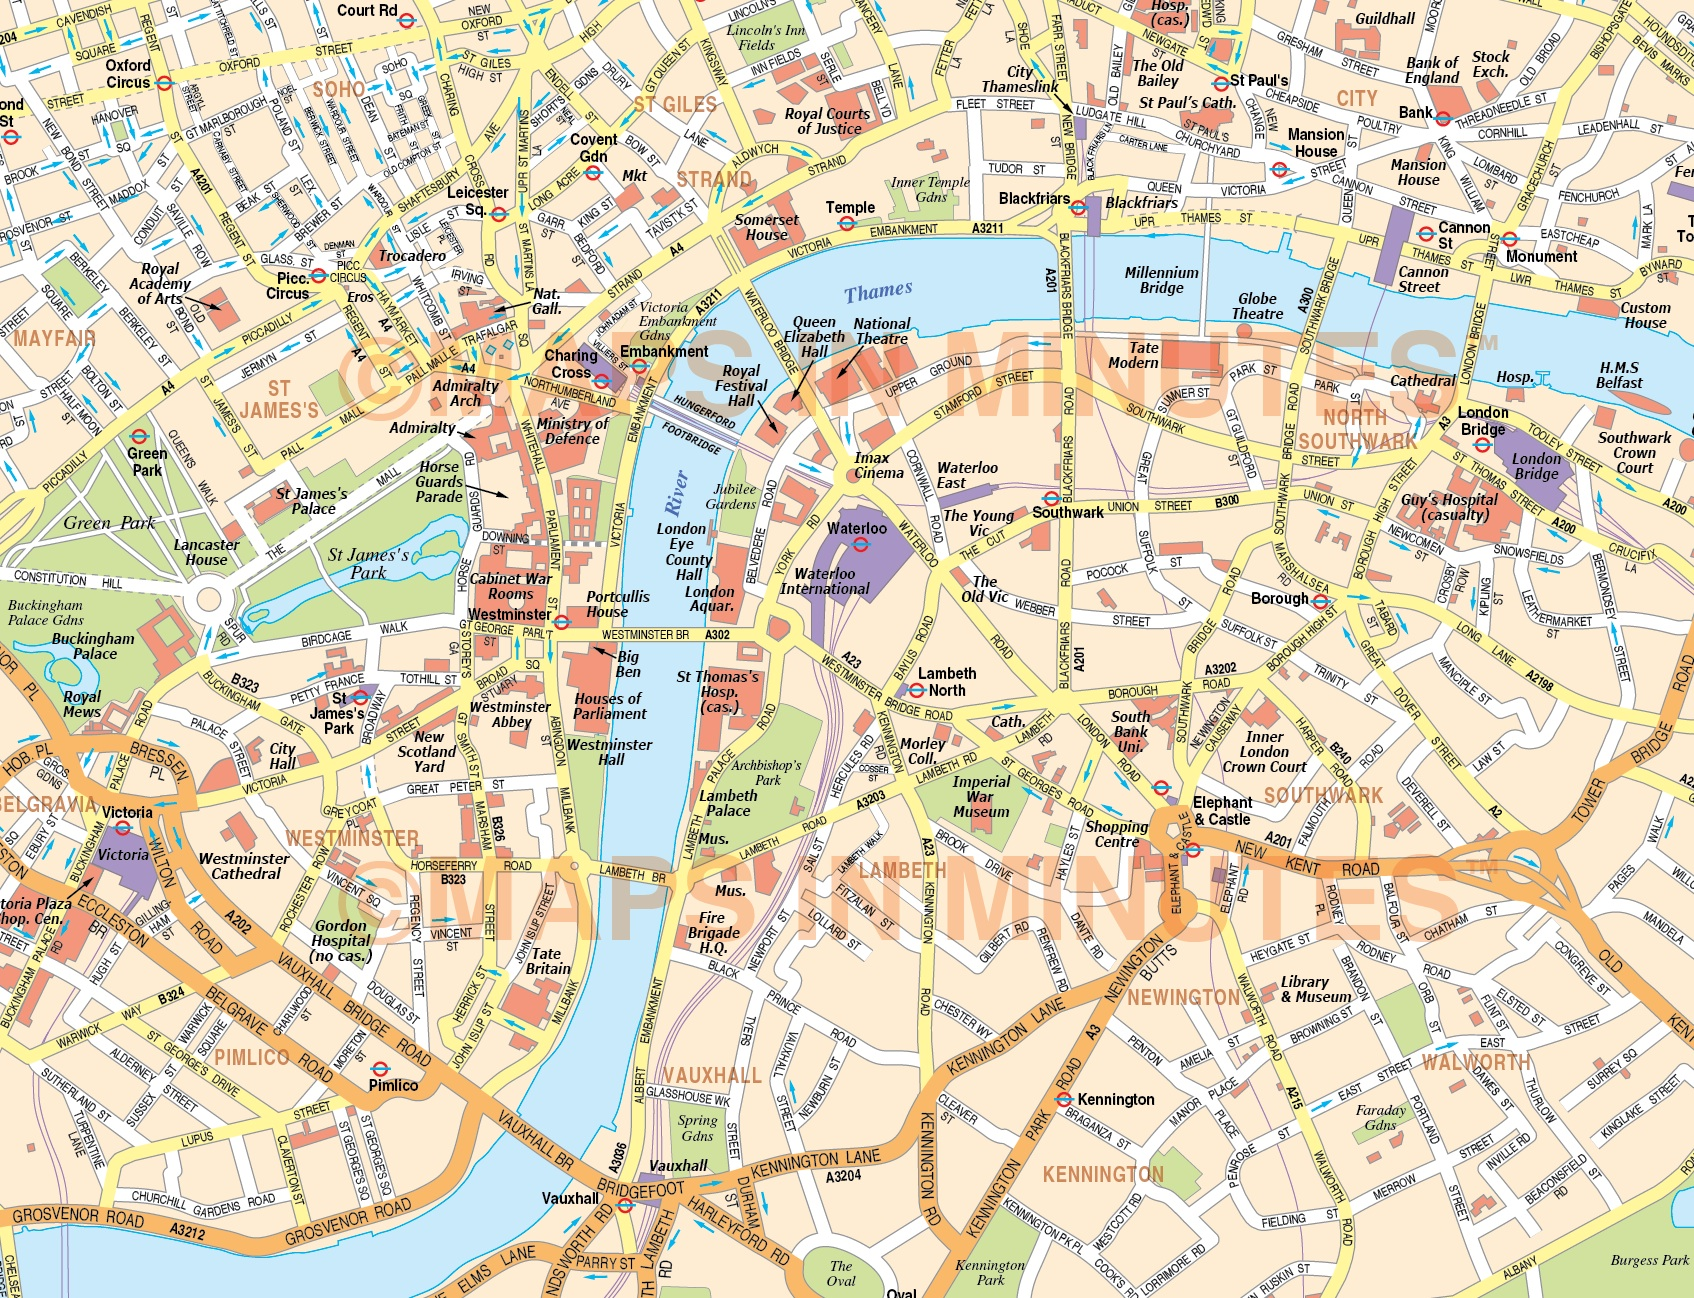 London City Map Printable.Digital Vector Map Of London In Illustrator Editable Format Royalty